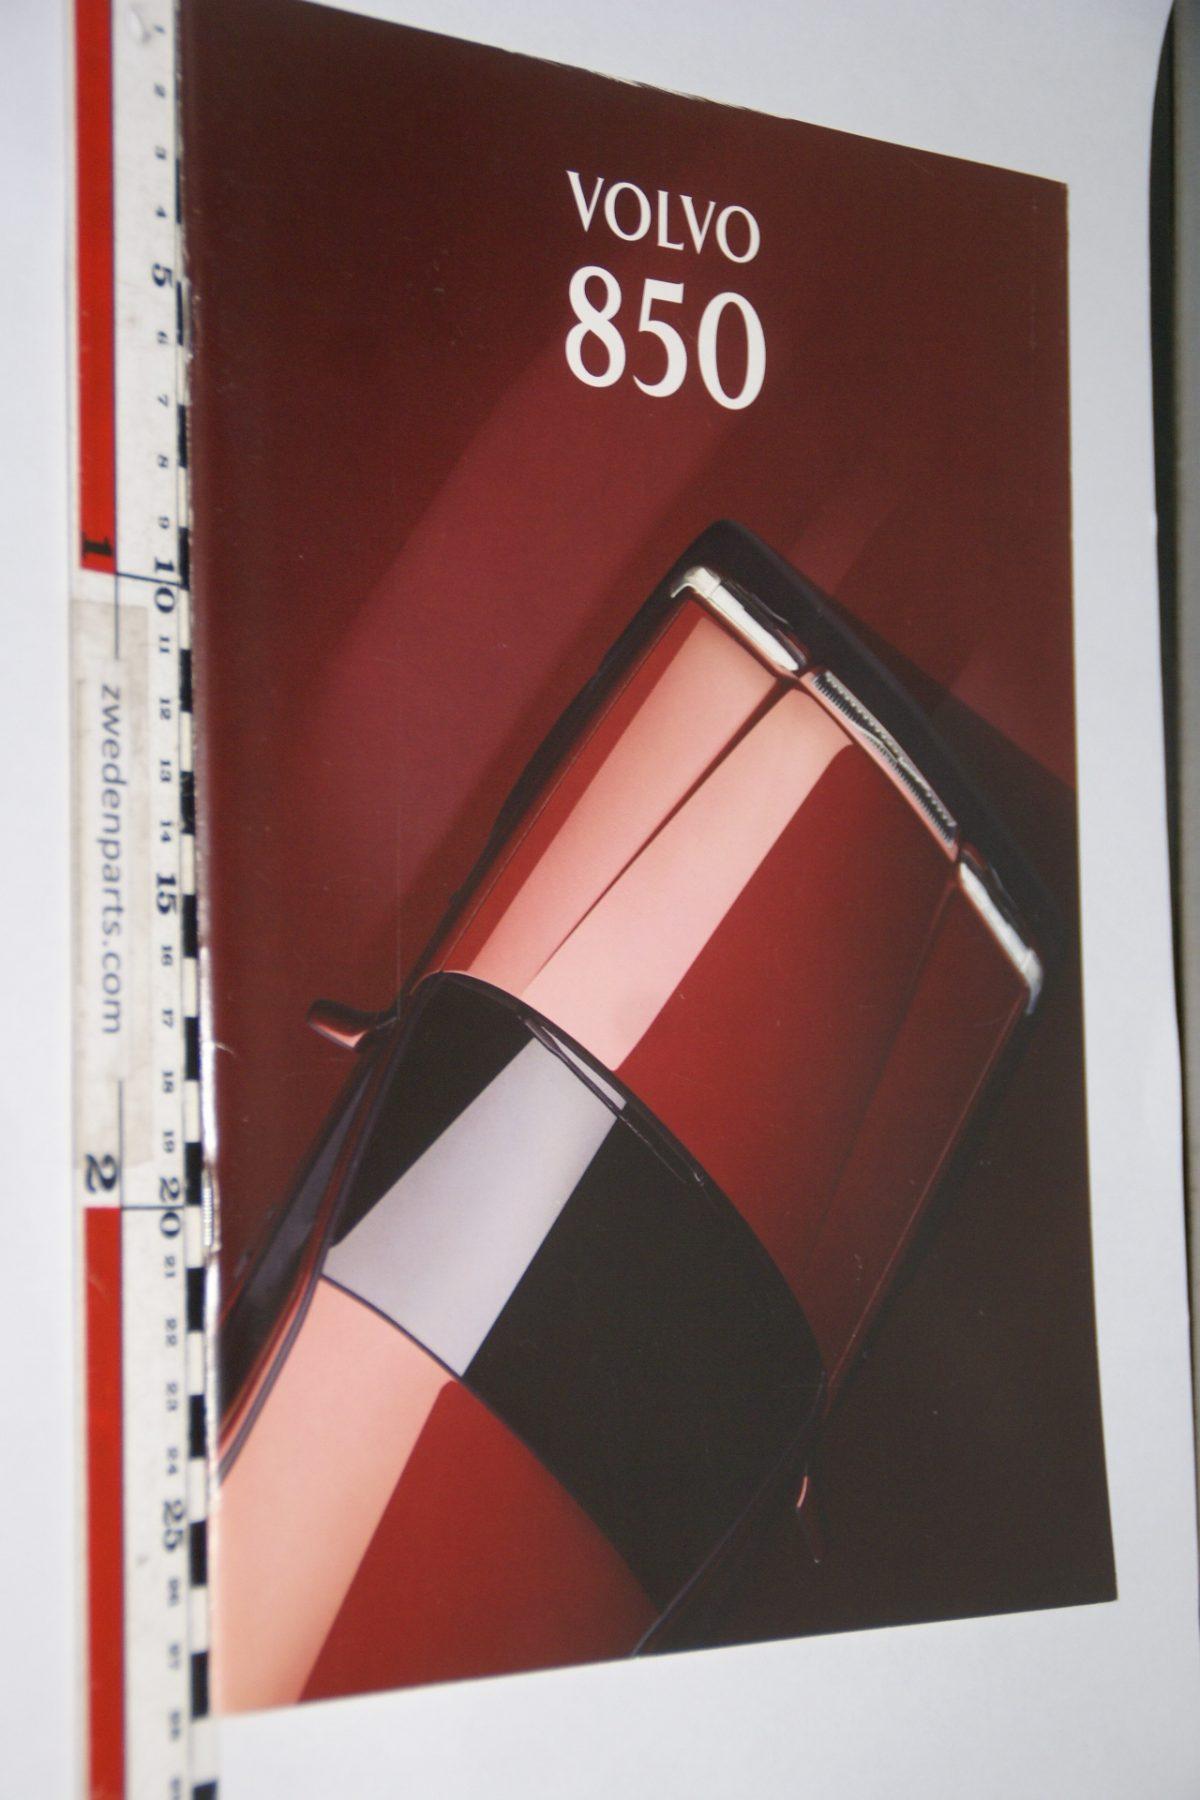 DSC06290 1994 brochure Volvo 850 nr MSPV 6065-2